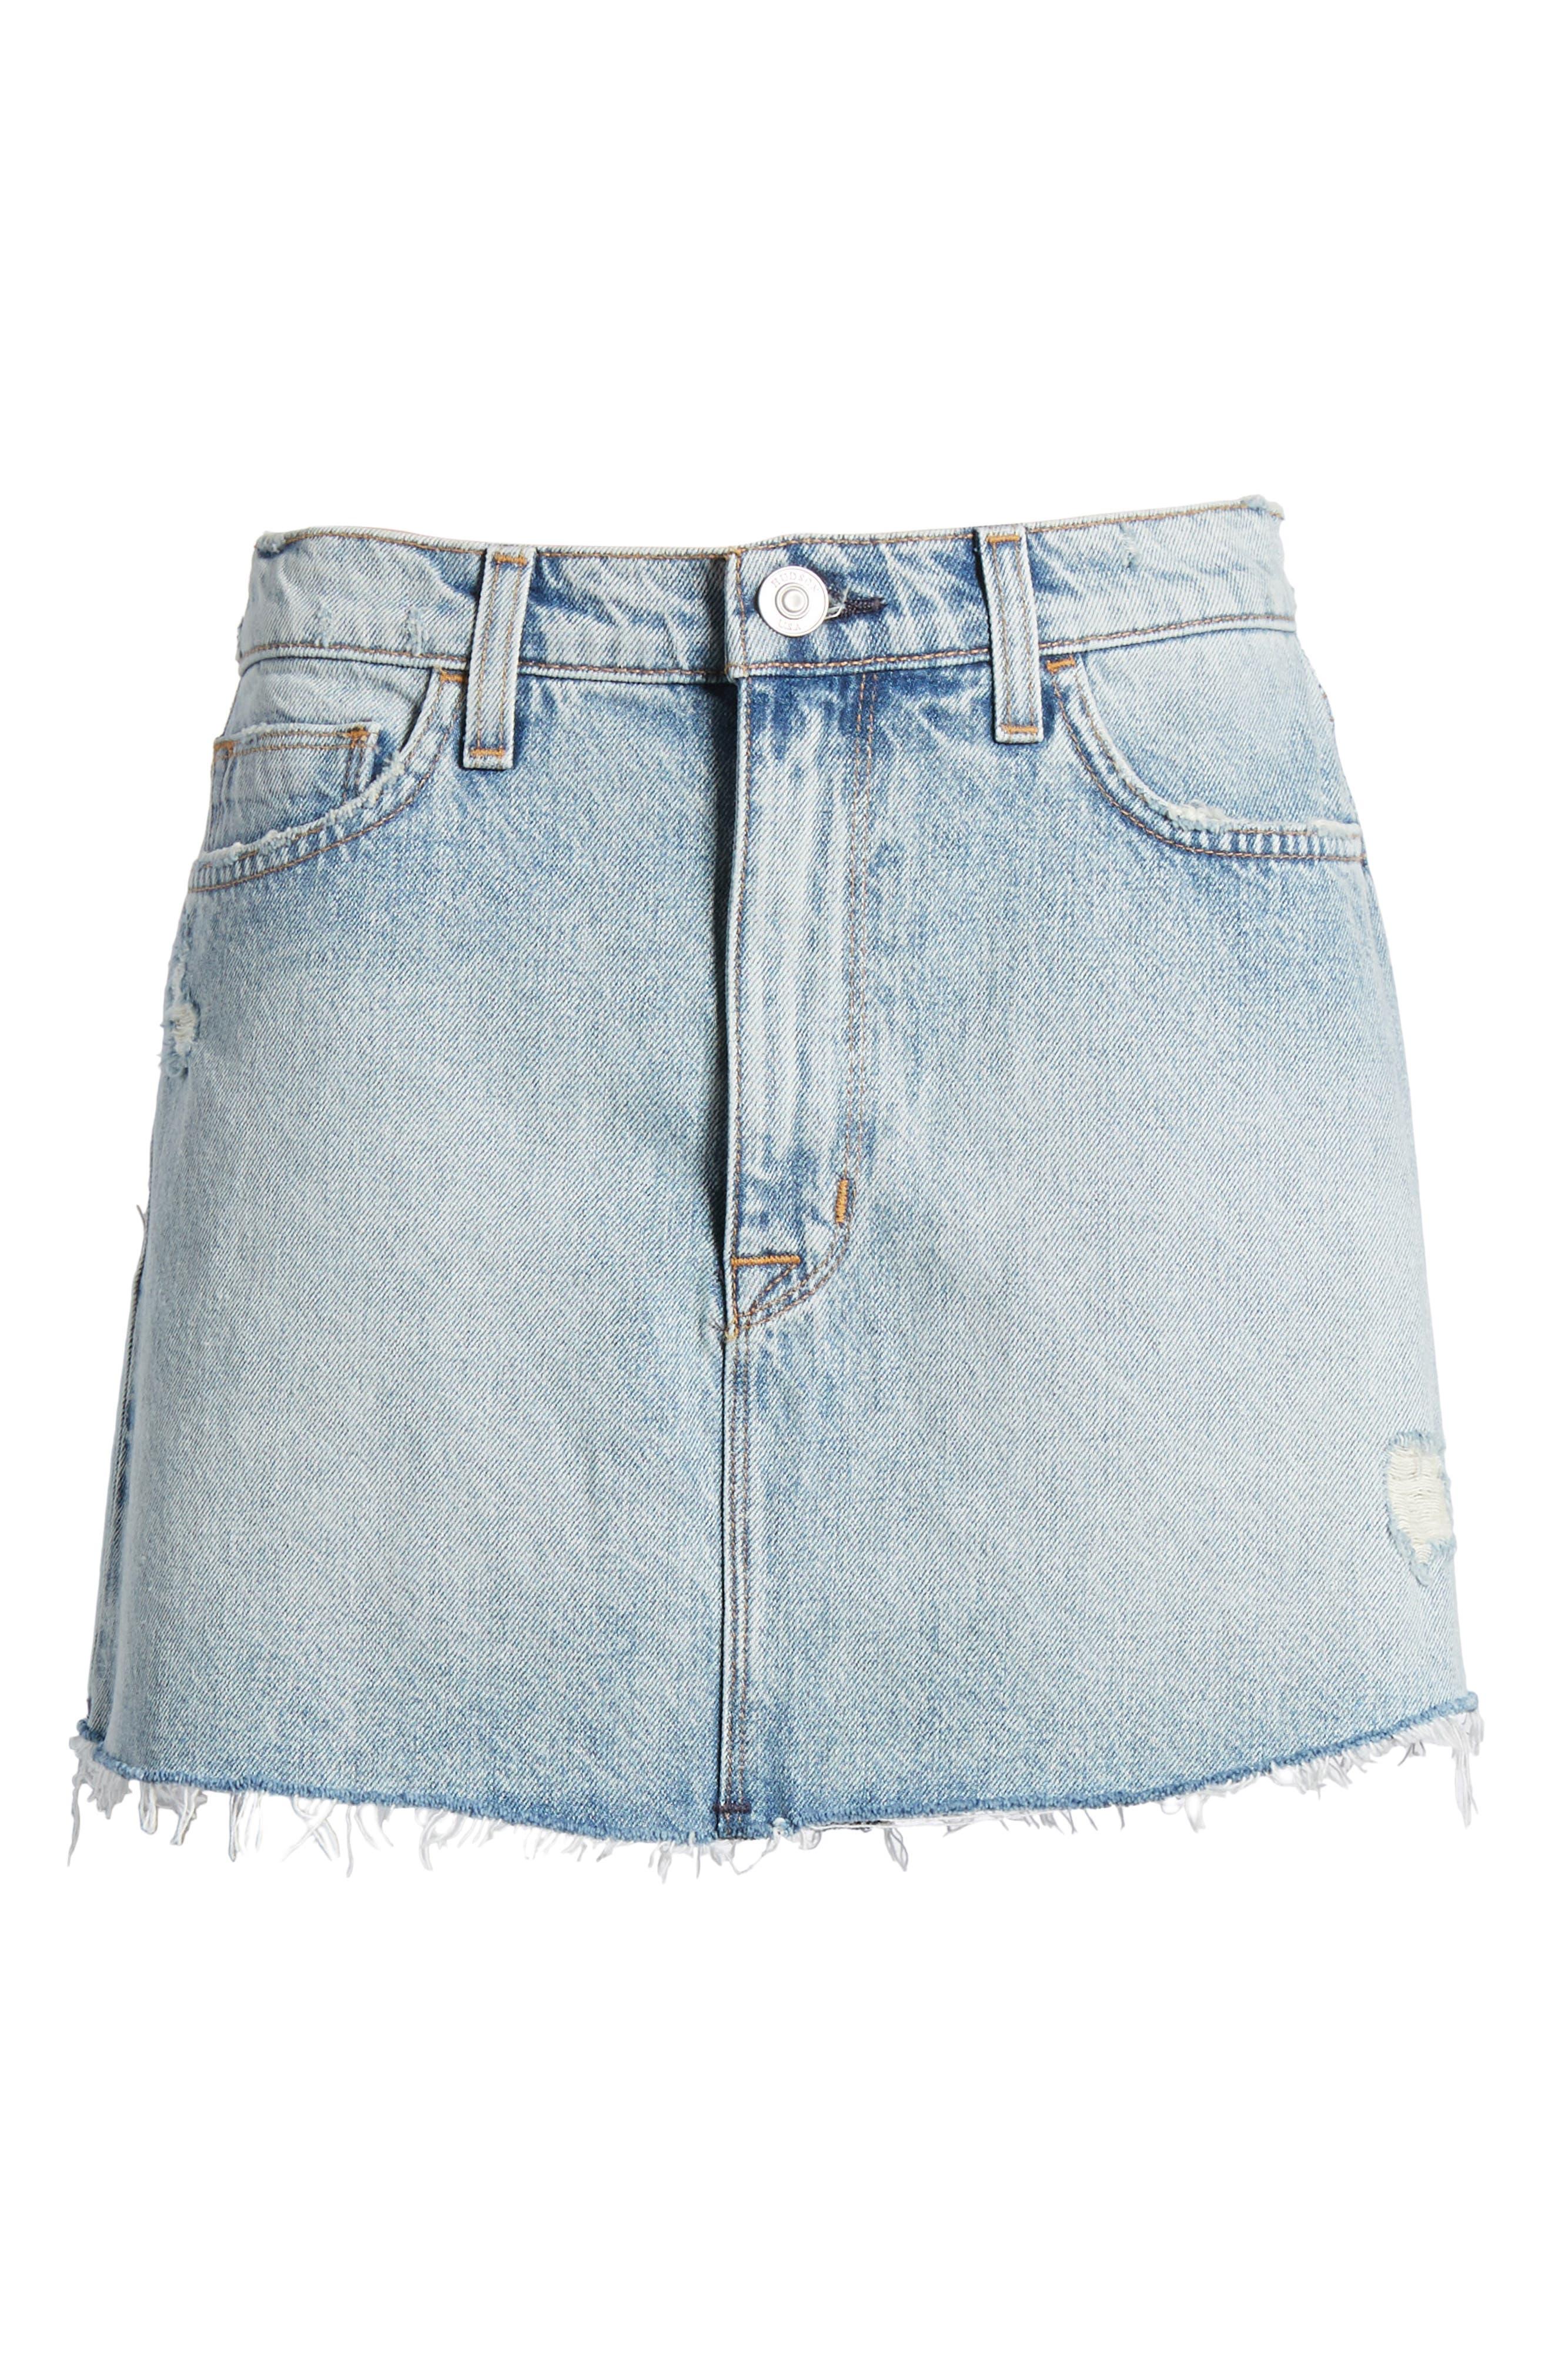 Vivid Cutoff Denim Miniskirt,                             Alternate thumbnail 7, color,